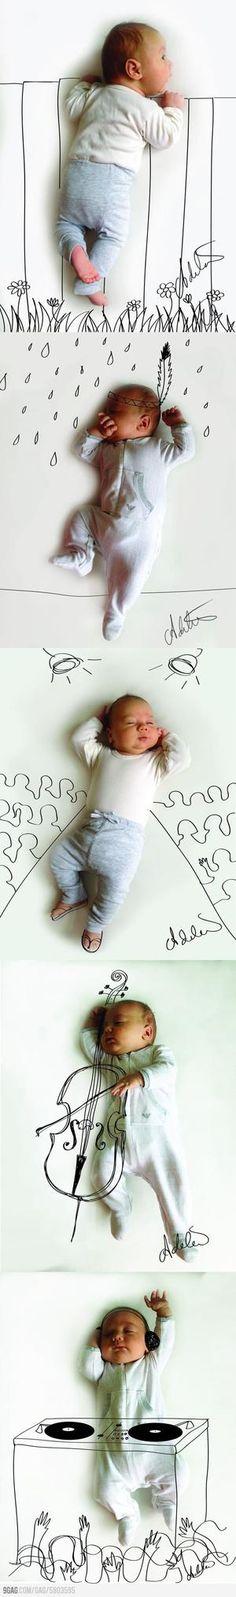 Leuk idee om te tekenen op je kinderfoto's!